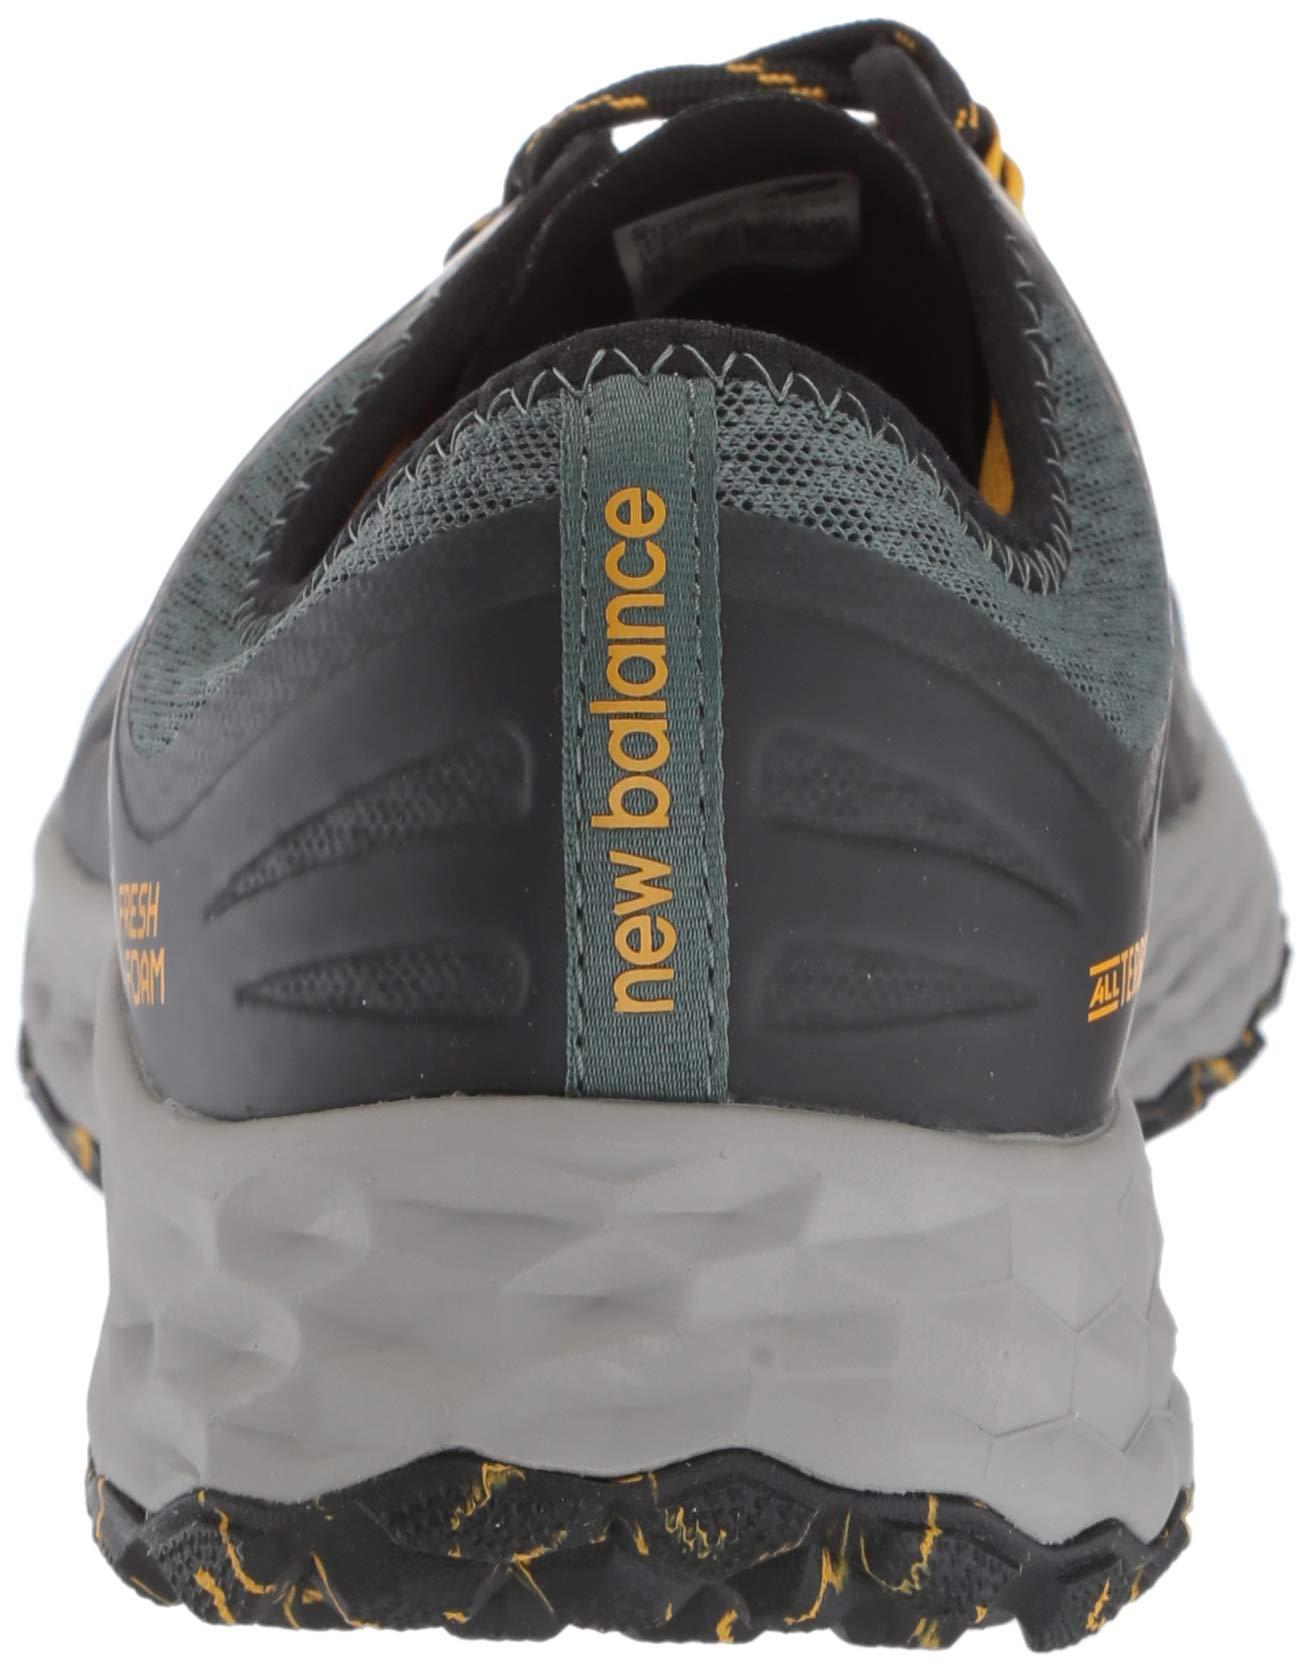 New Balance Men's Kaymin V1 Fresh Foam Trail Running Shoe, Faded Rosin/Black/Brass, 1.5 D US by New Balance (Image #2)